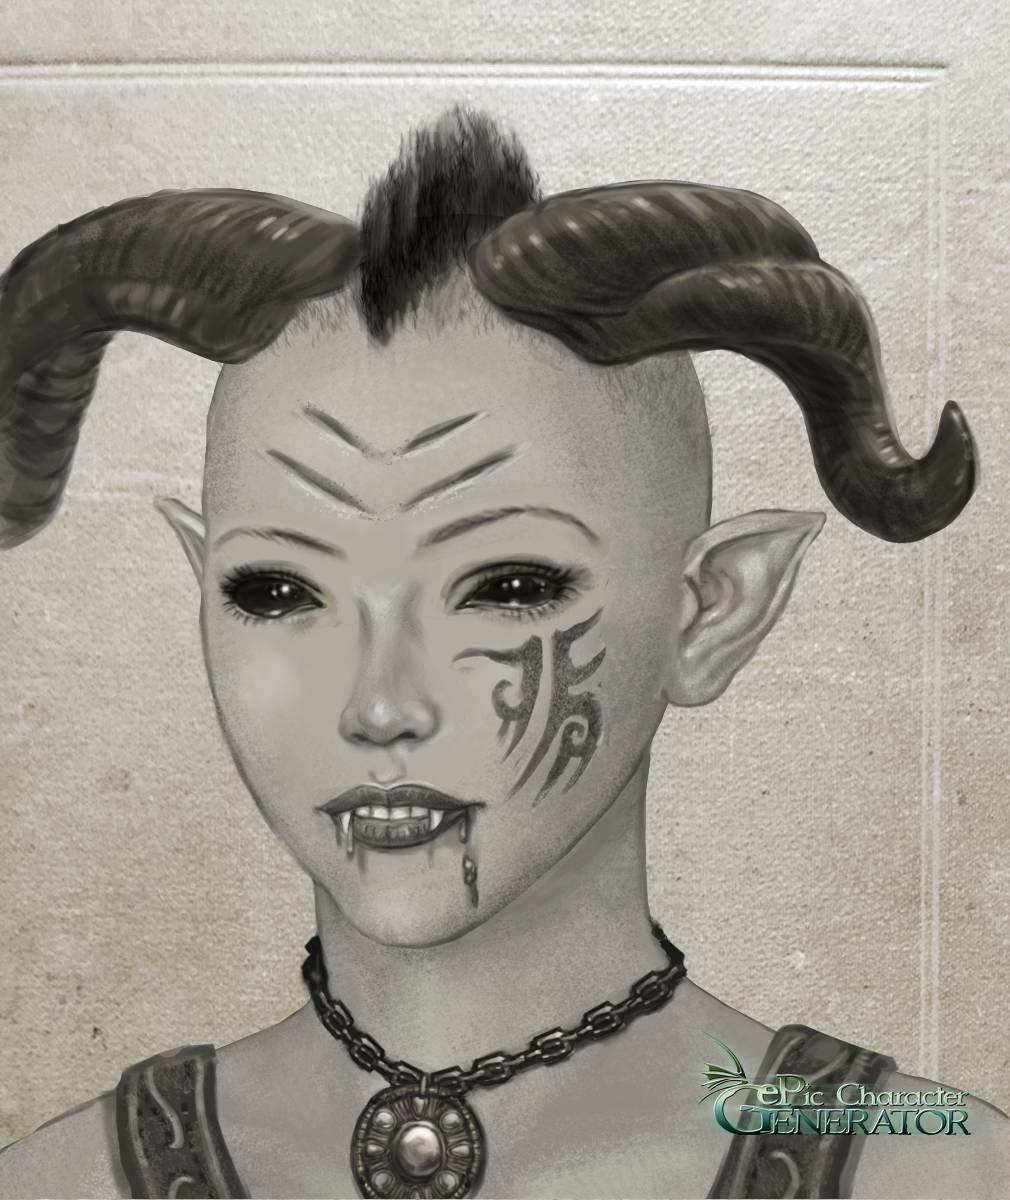 ePic Character Generator Season 3 Female Portrait Screenshot 08